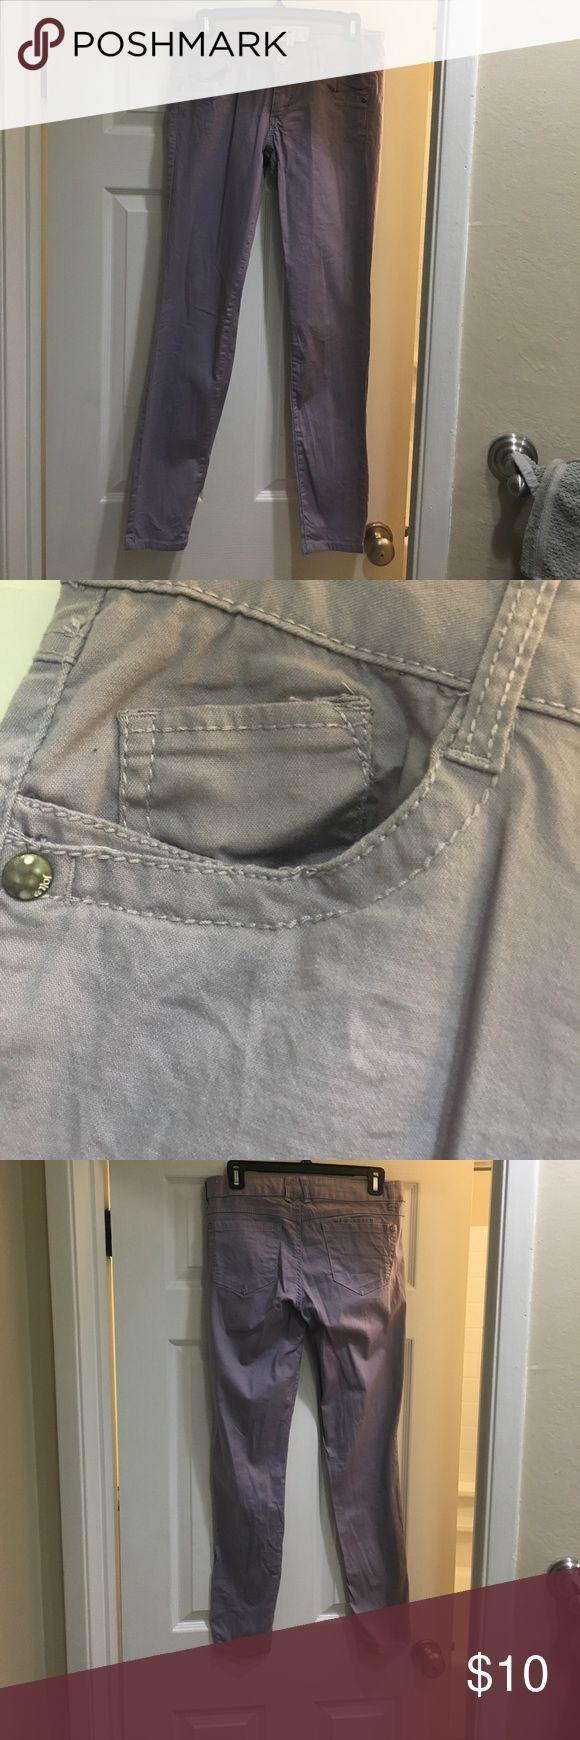 Jolt (juniors) purple skinny jeans (size 7). Light purple skinny jolt jeans. With small pocket detail. Jolt Jeans Skinny